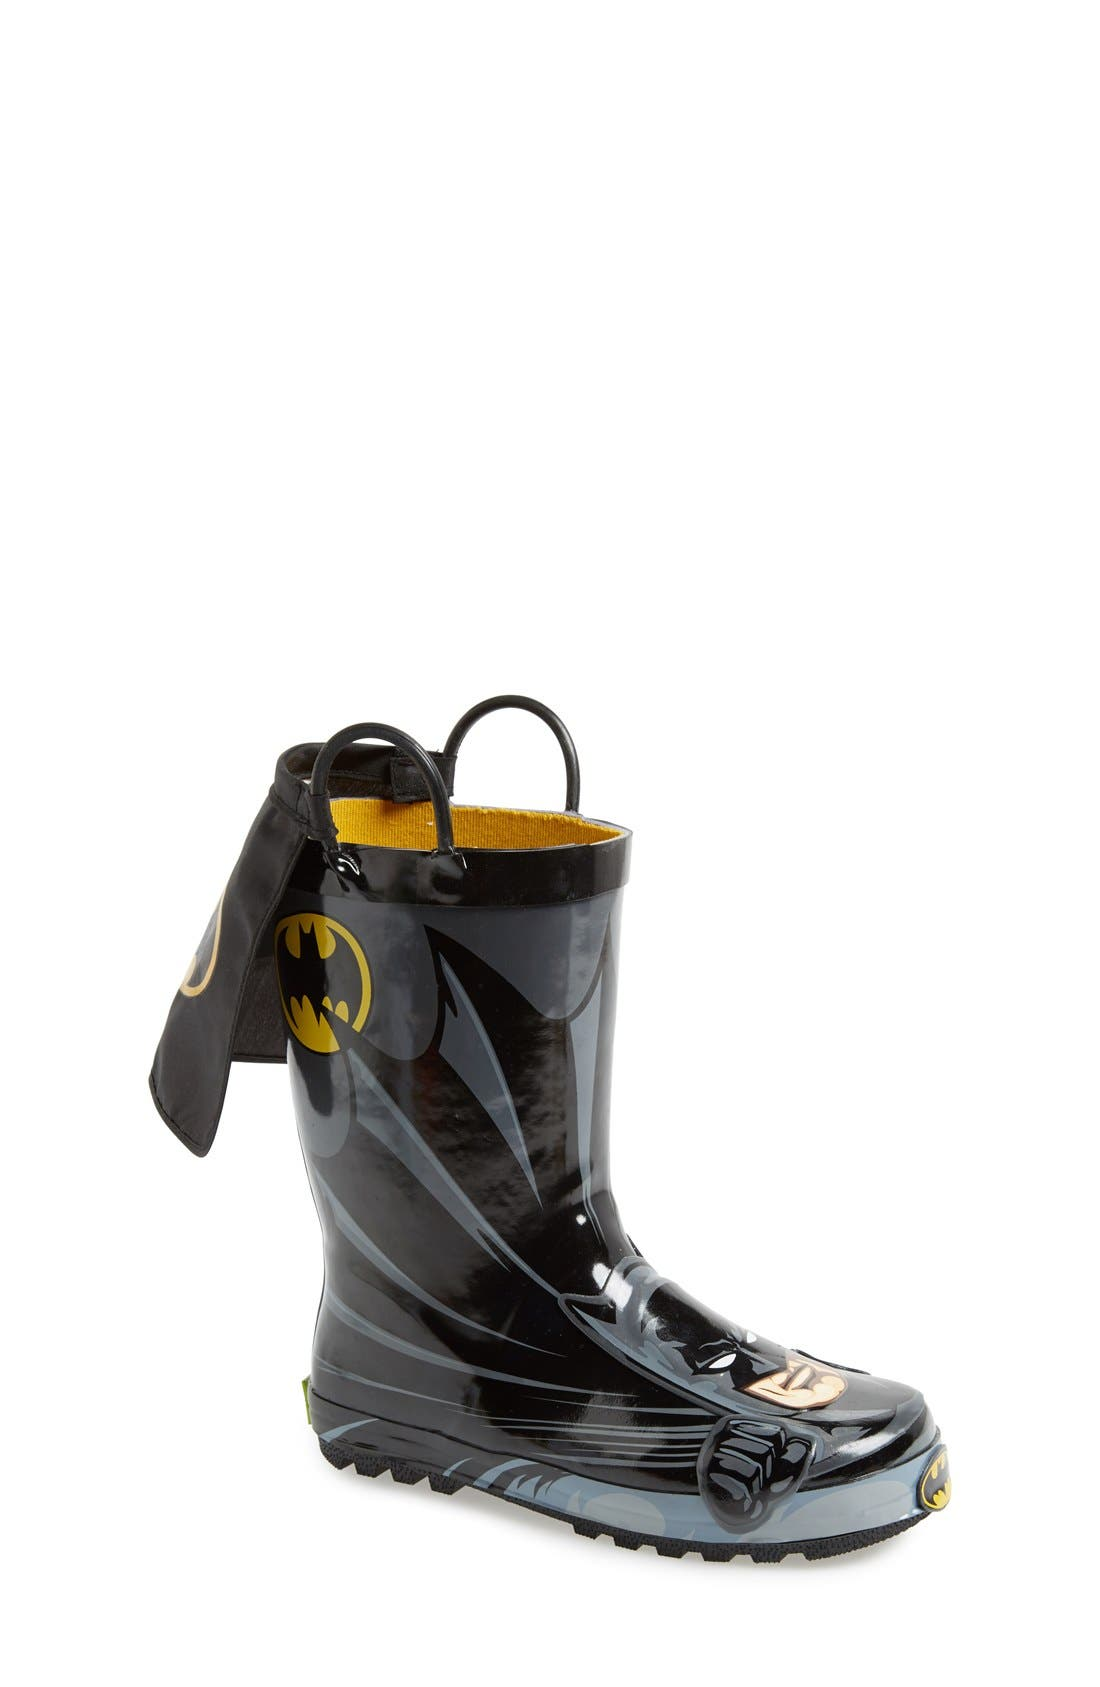 'Batman Everlasting' Waterproof Rain Boot,                             Main thumbnail 1, color,                             Black/ Black